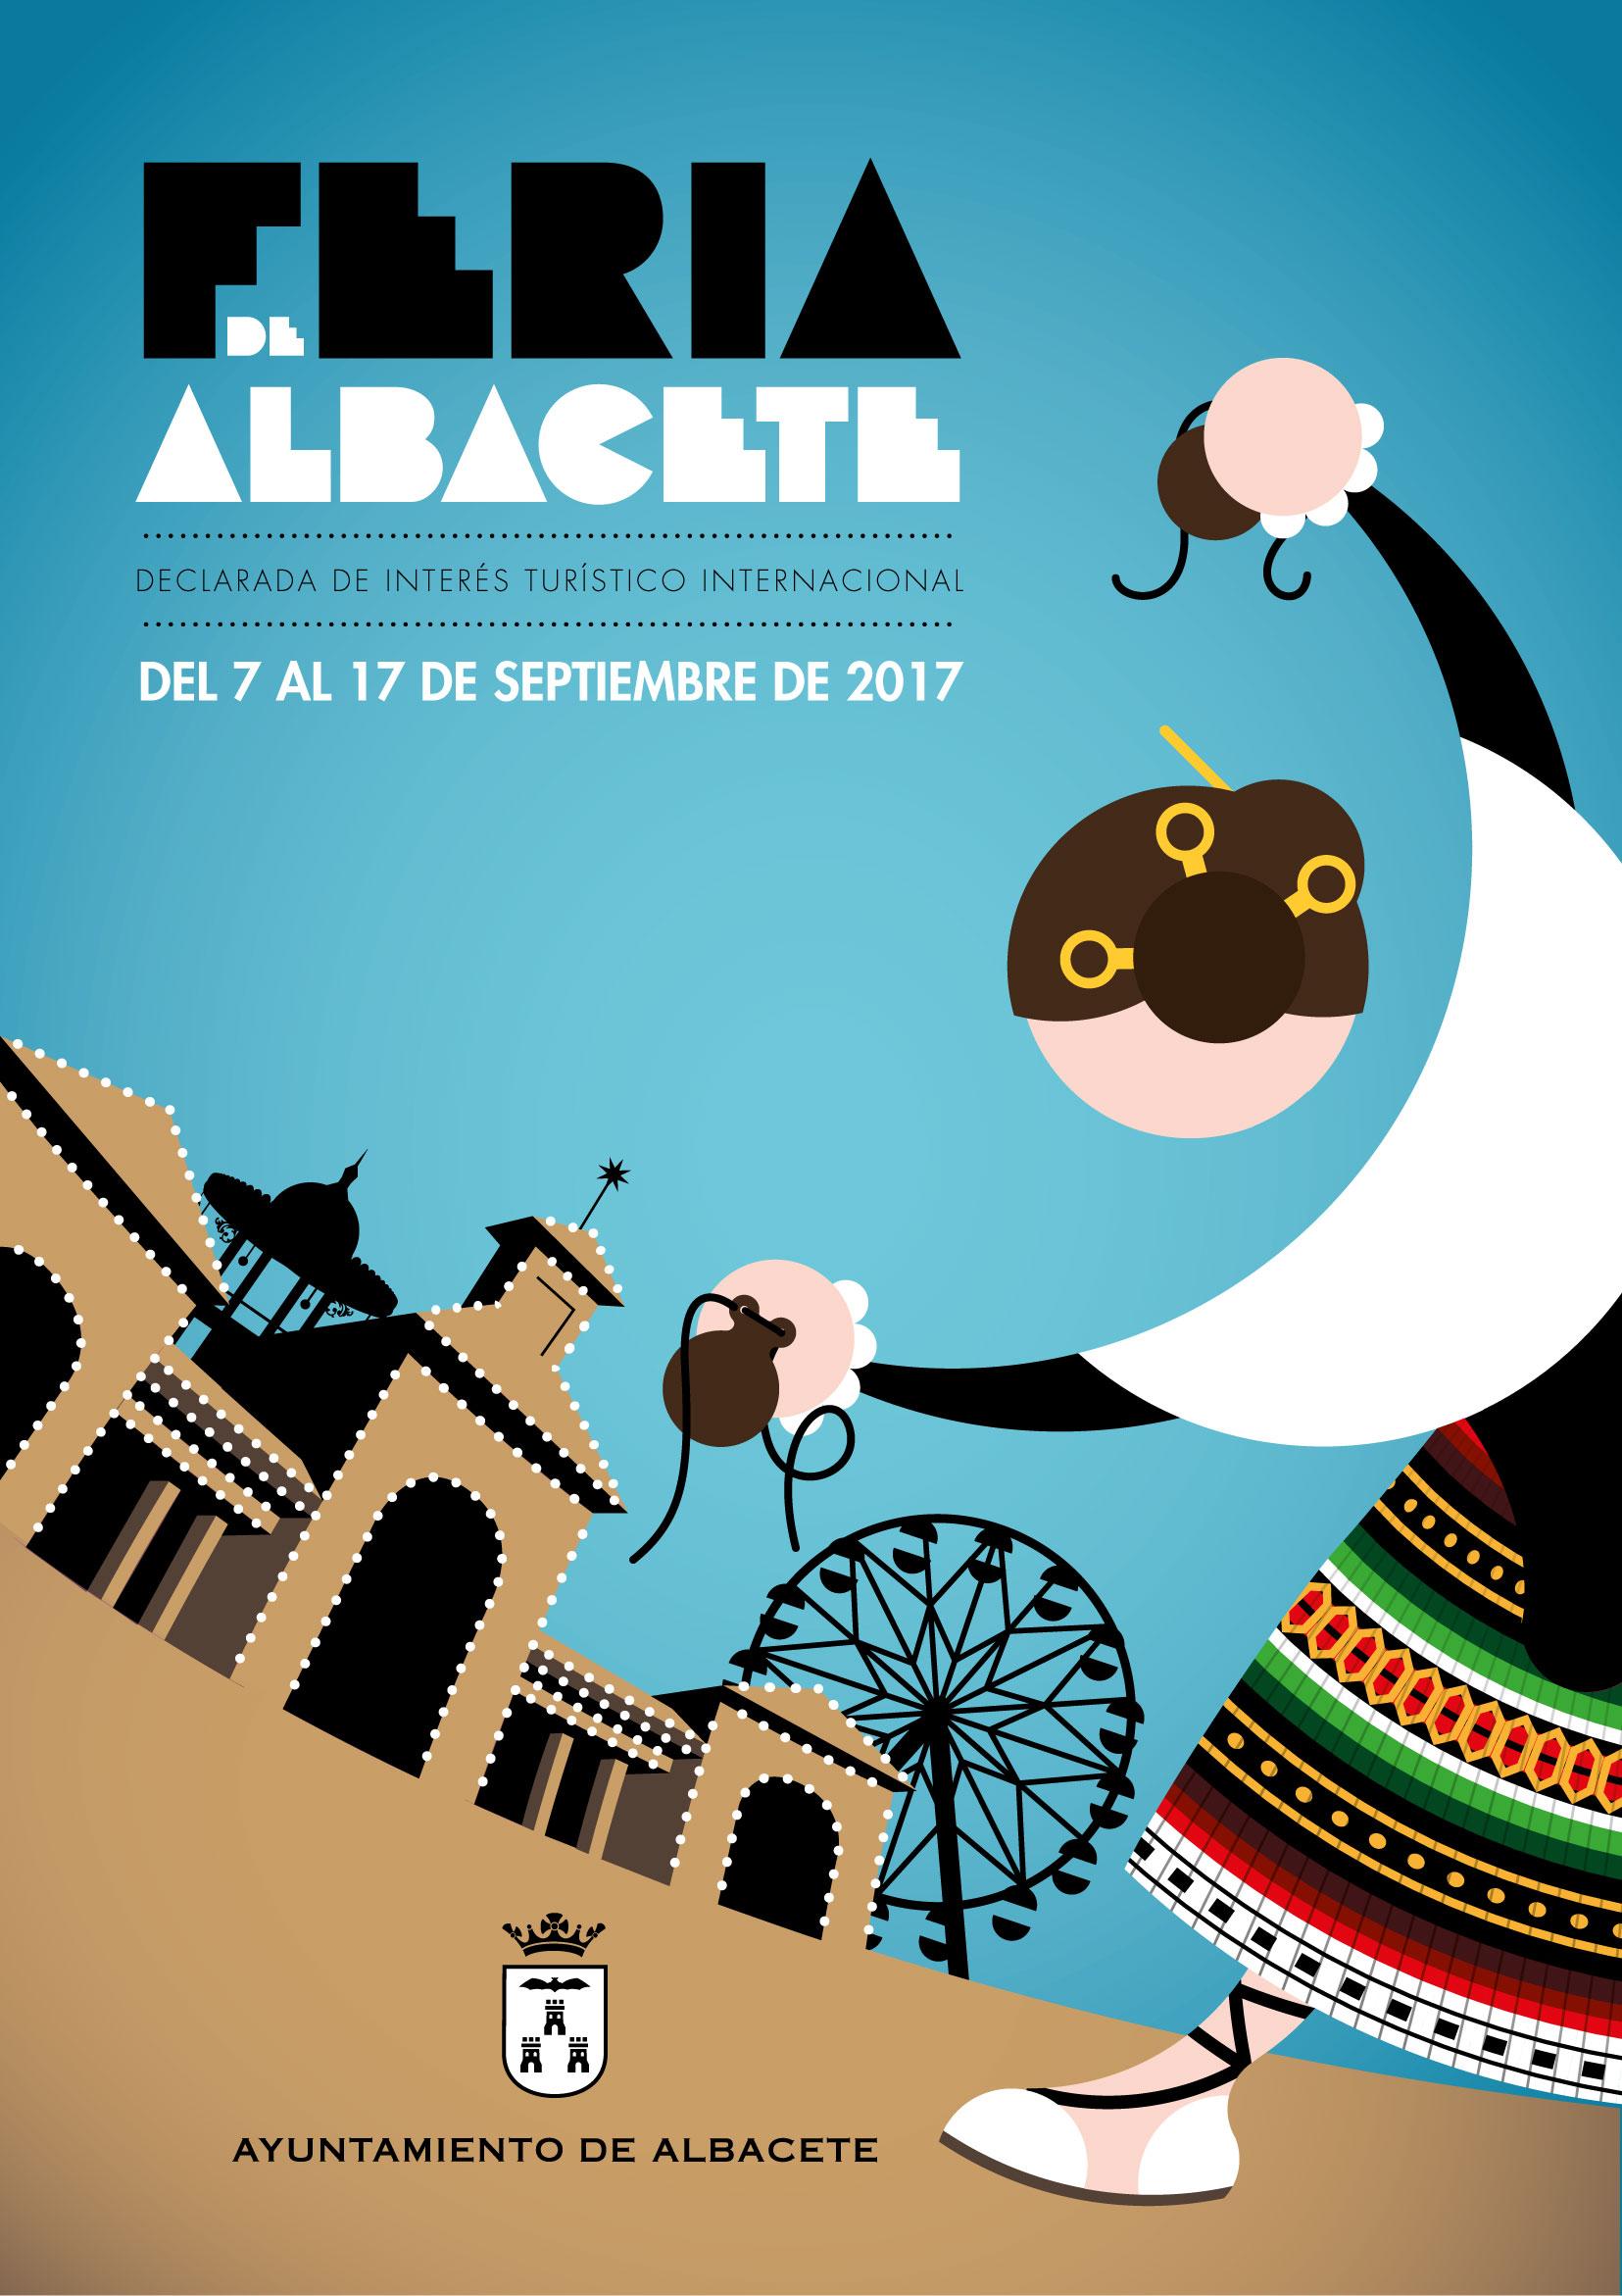 Cartel Feria de Albacete